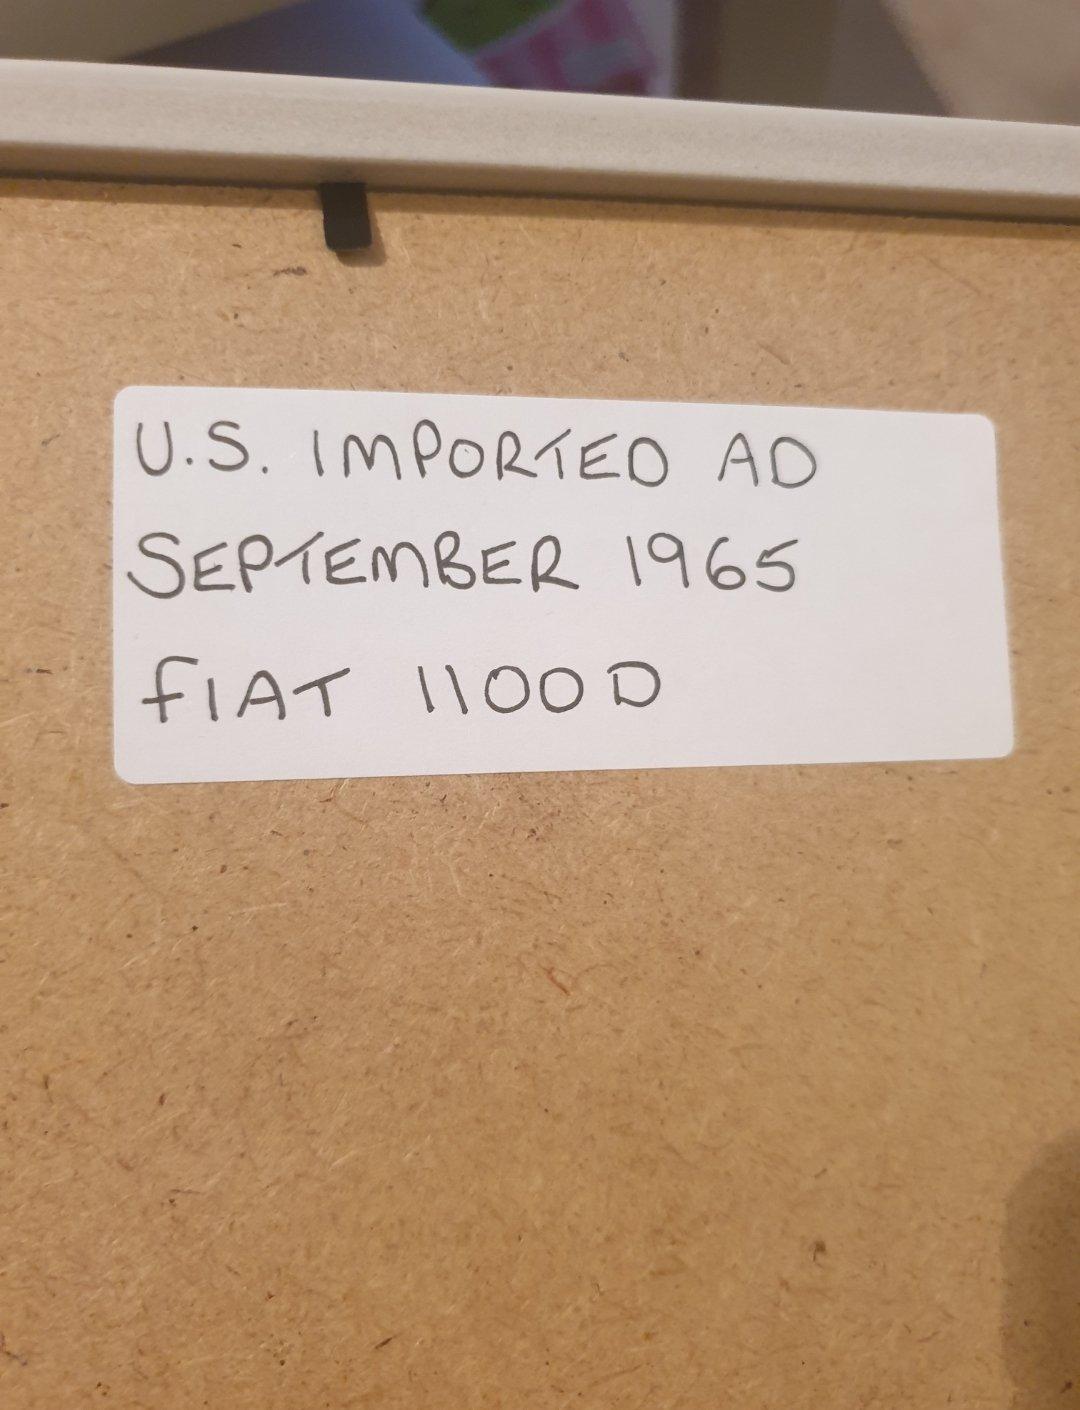 1965 Original Fiat 1100D Framed Advert For Sale (picture 2 of 2)